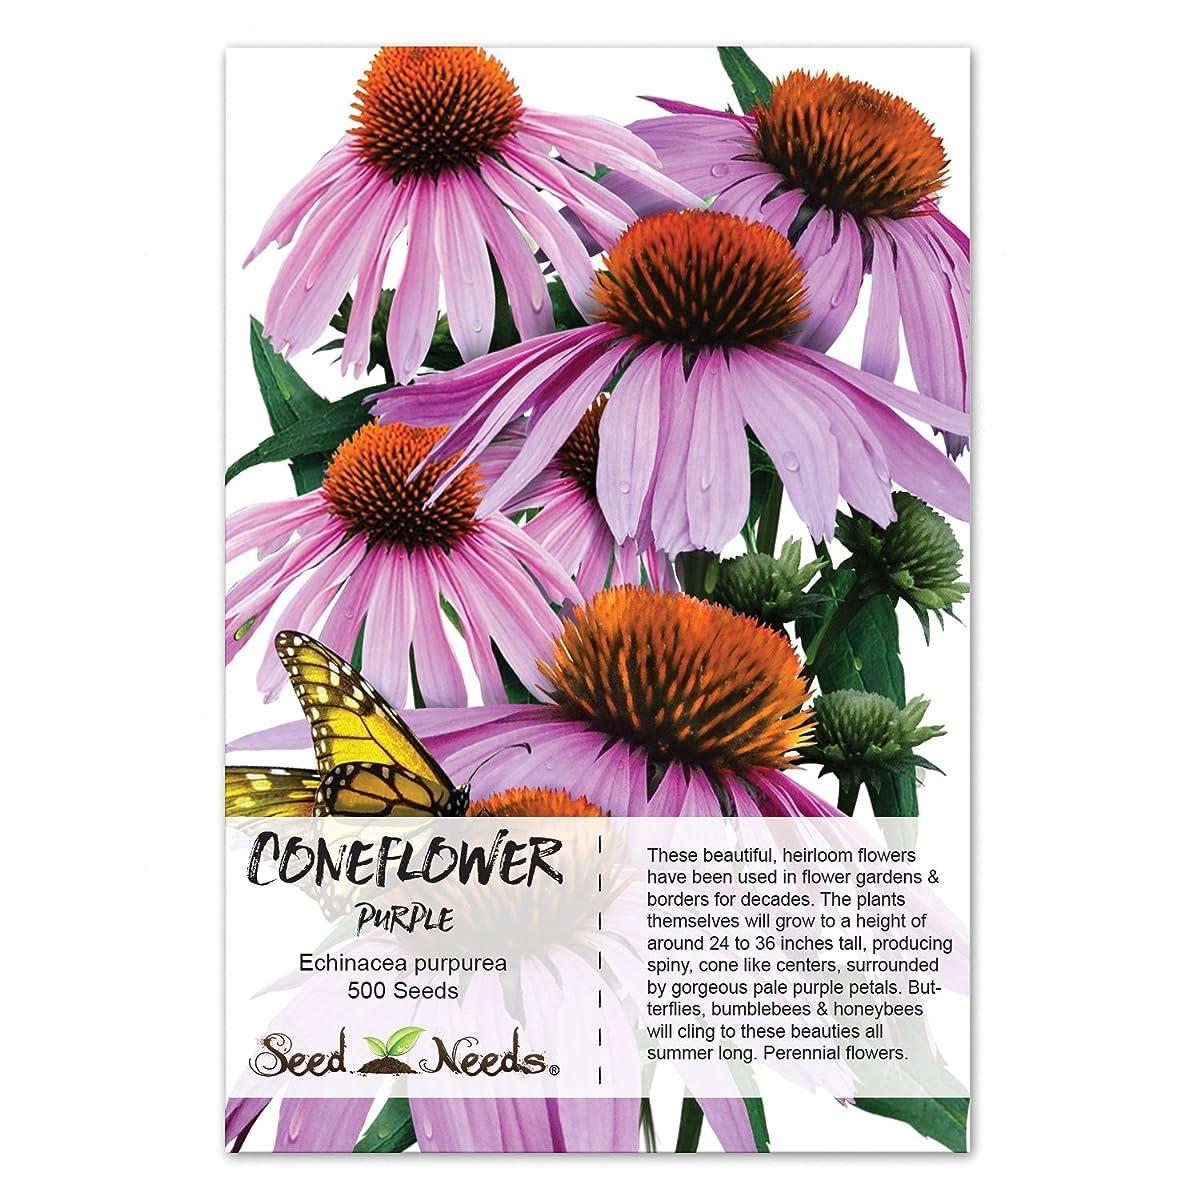 Package of 500 Seeds, Purple Coneflower (Echinacea purpurea) Non-GMO Seeds by Seed Needs